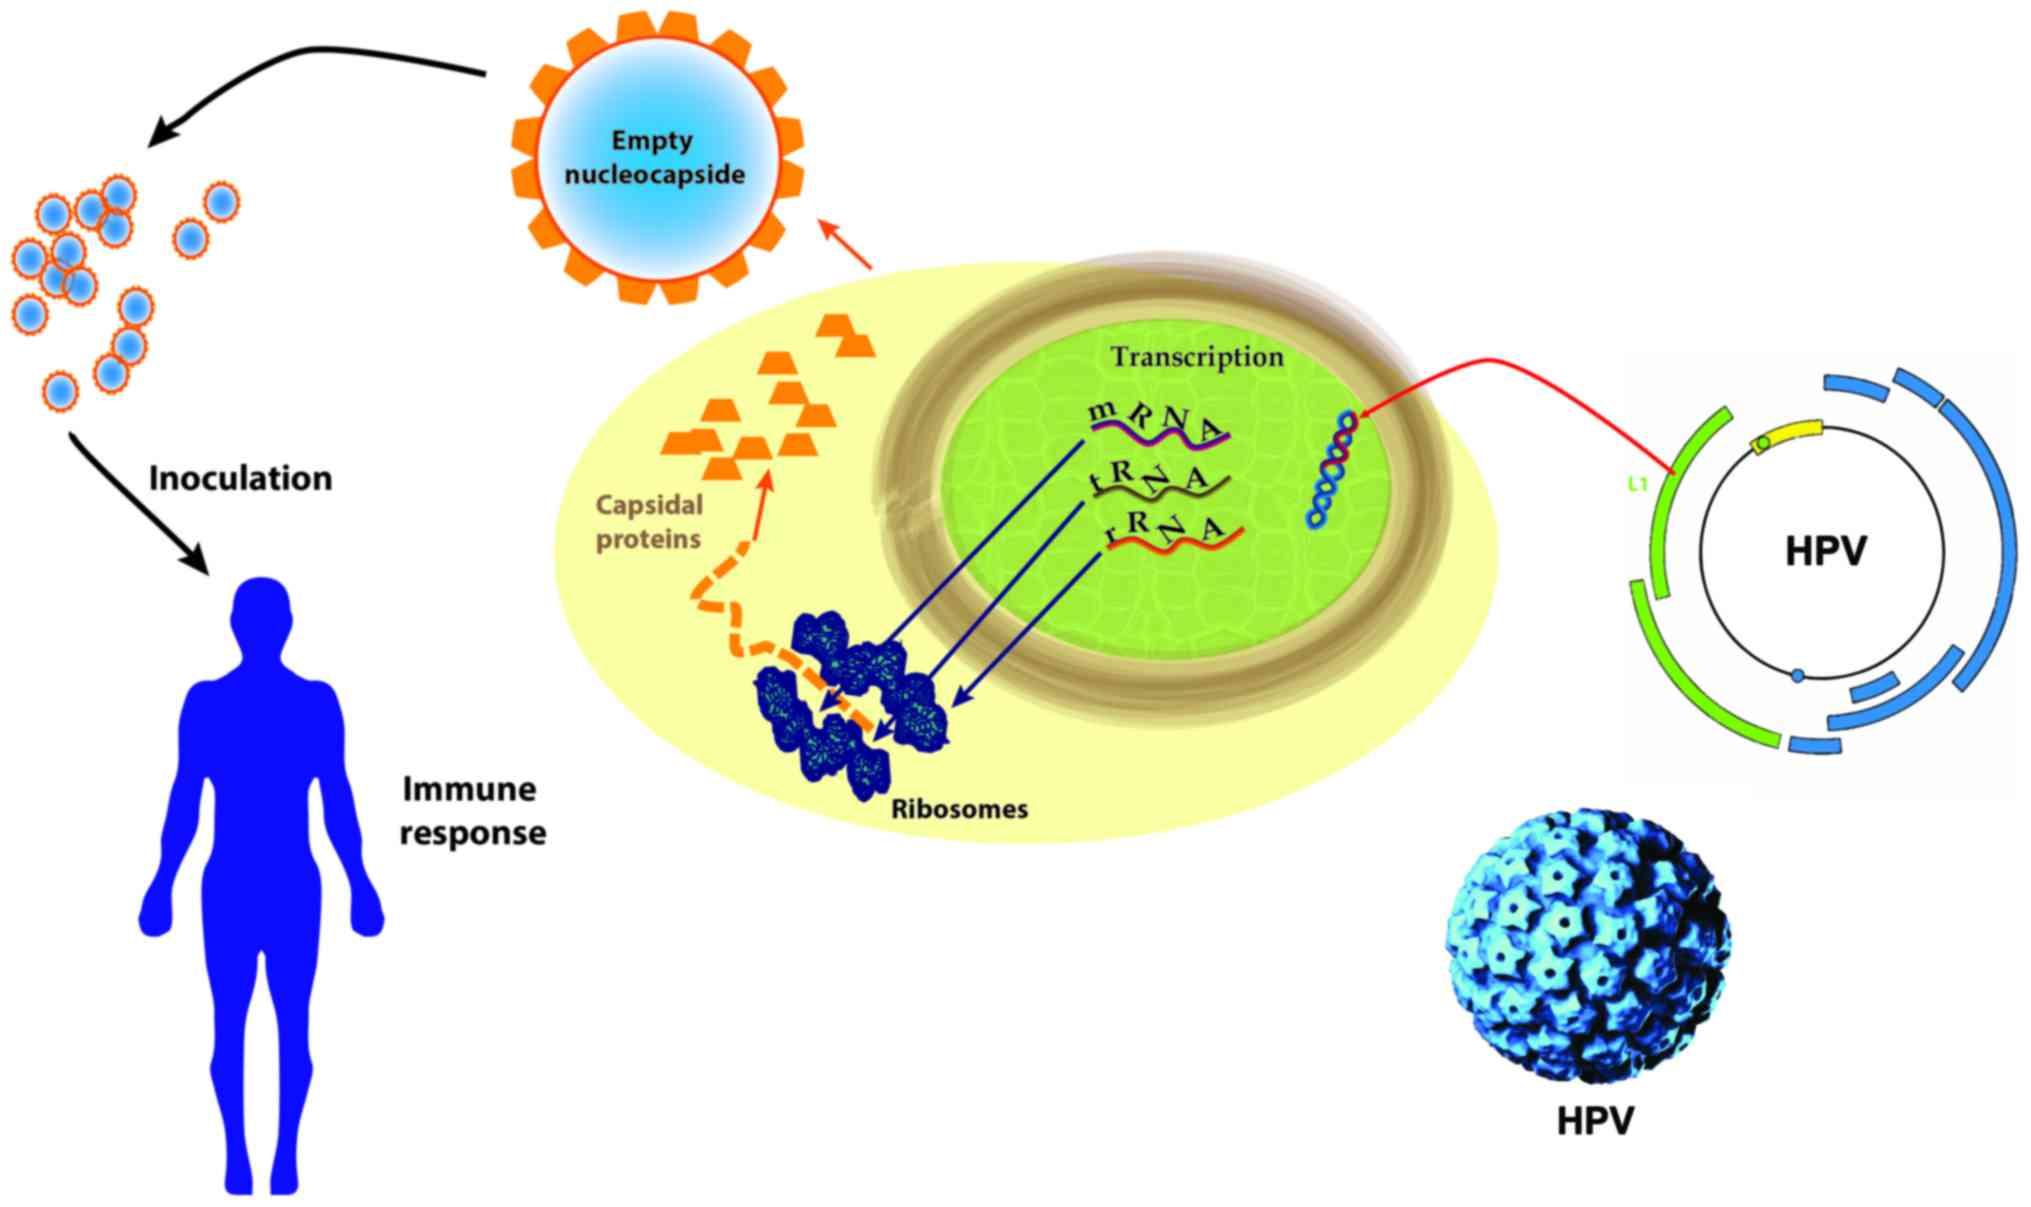 hpv virus dna or rna